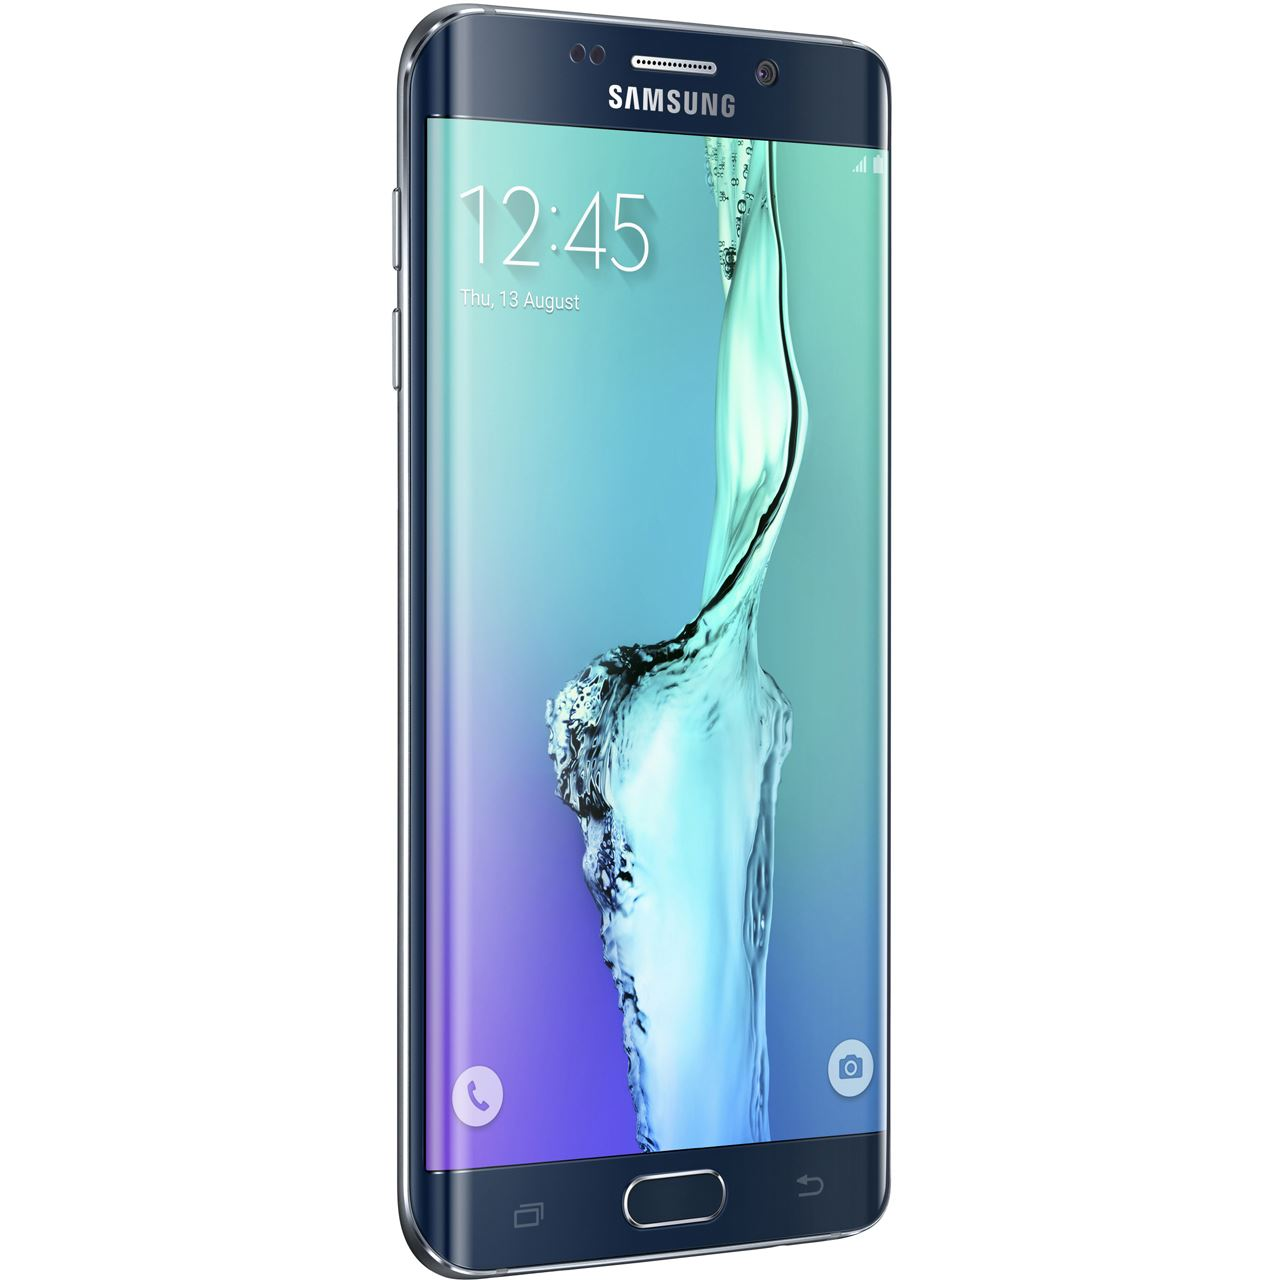 samsung galaxy s6 edge g928f 32 gb schwarz smartphones. Black Bedroom Furniture Sets. Home Design Ideas